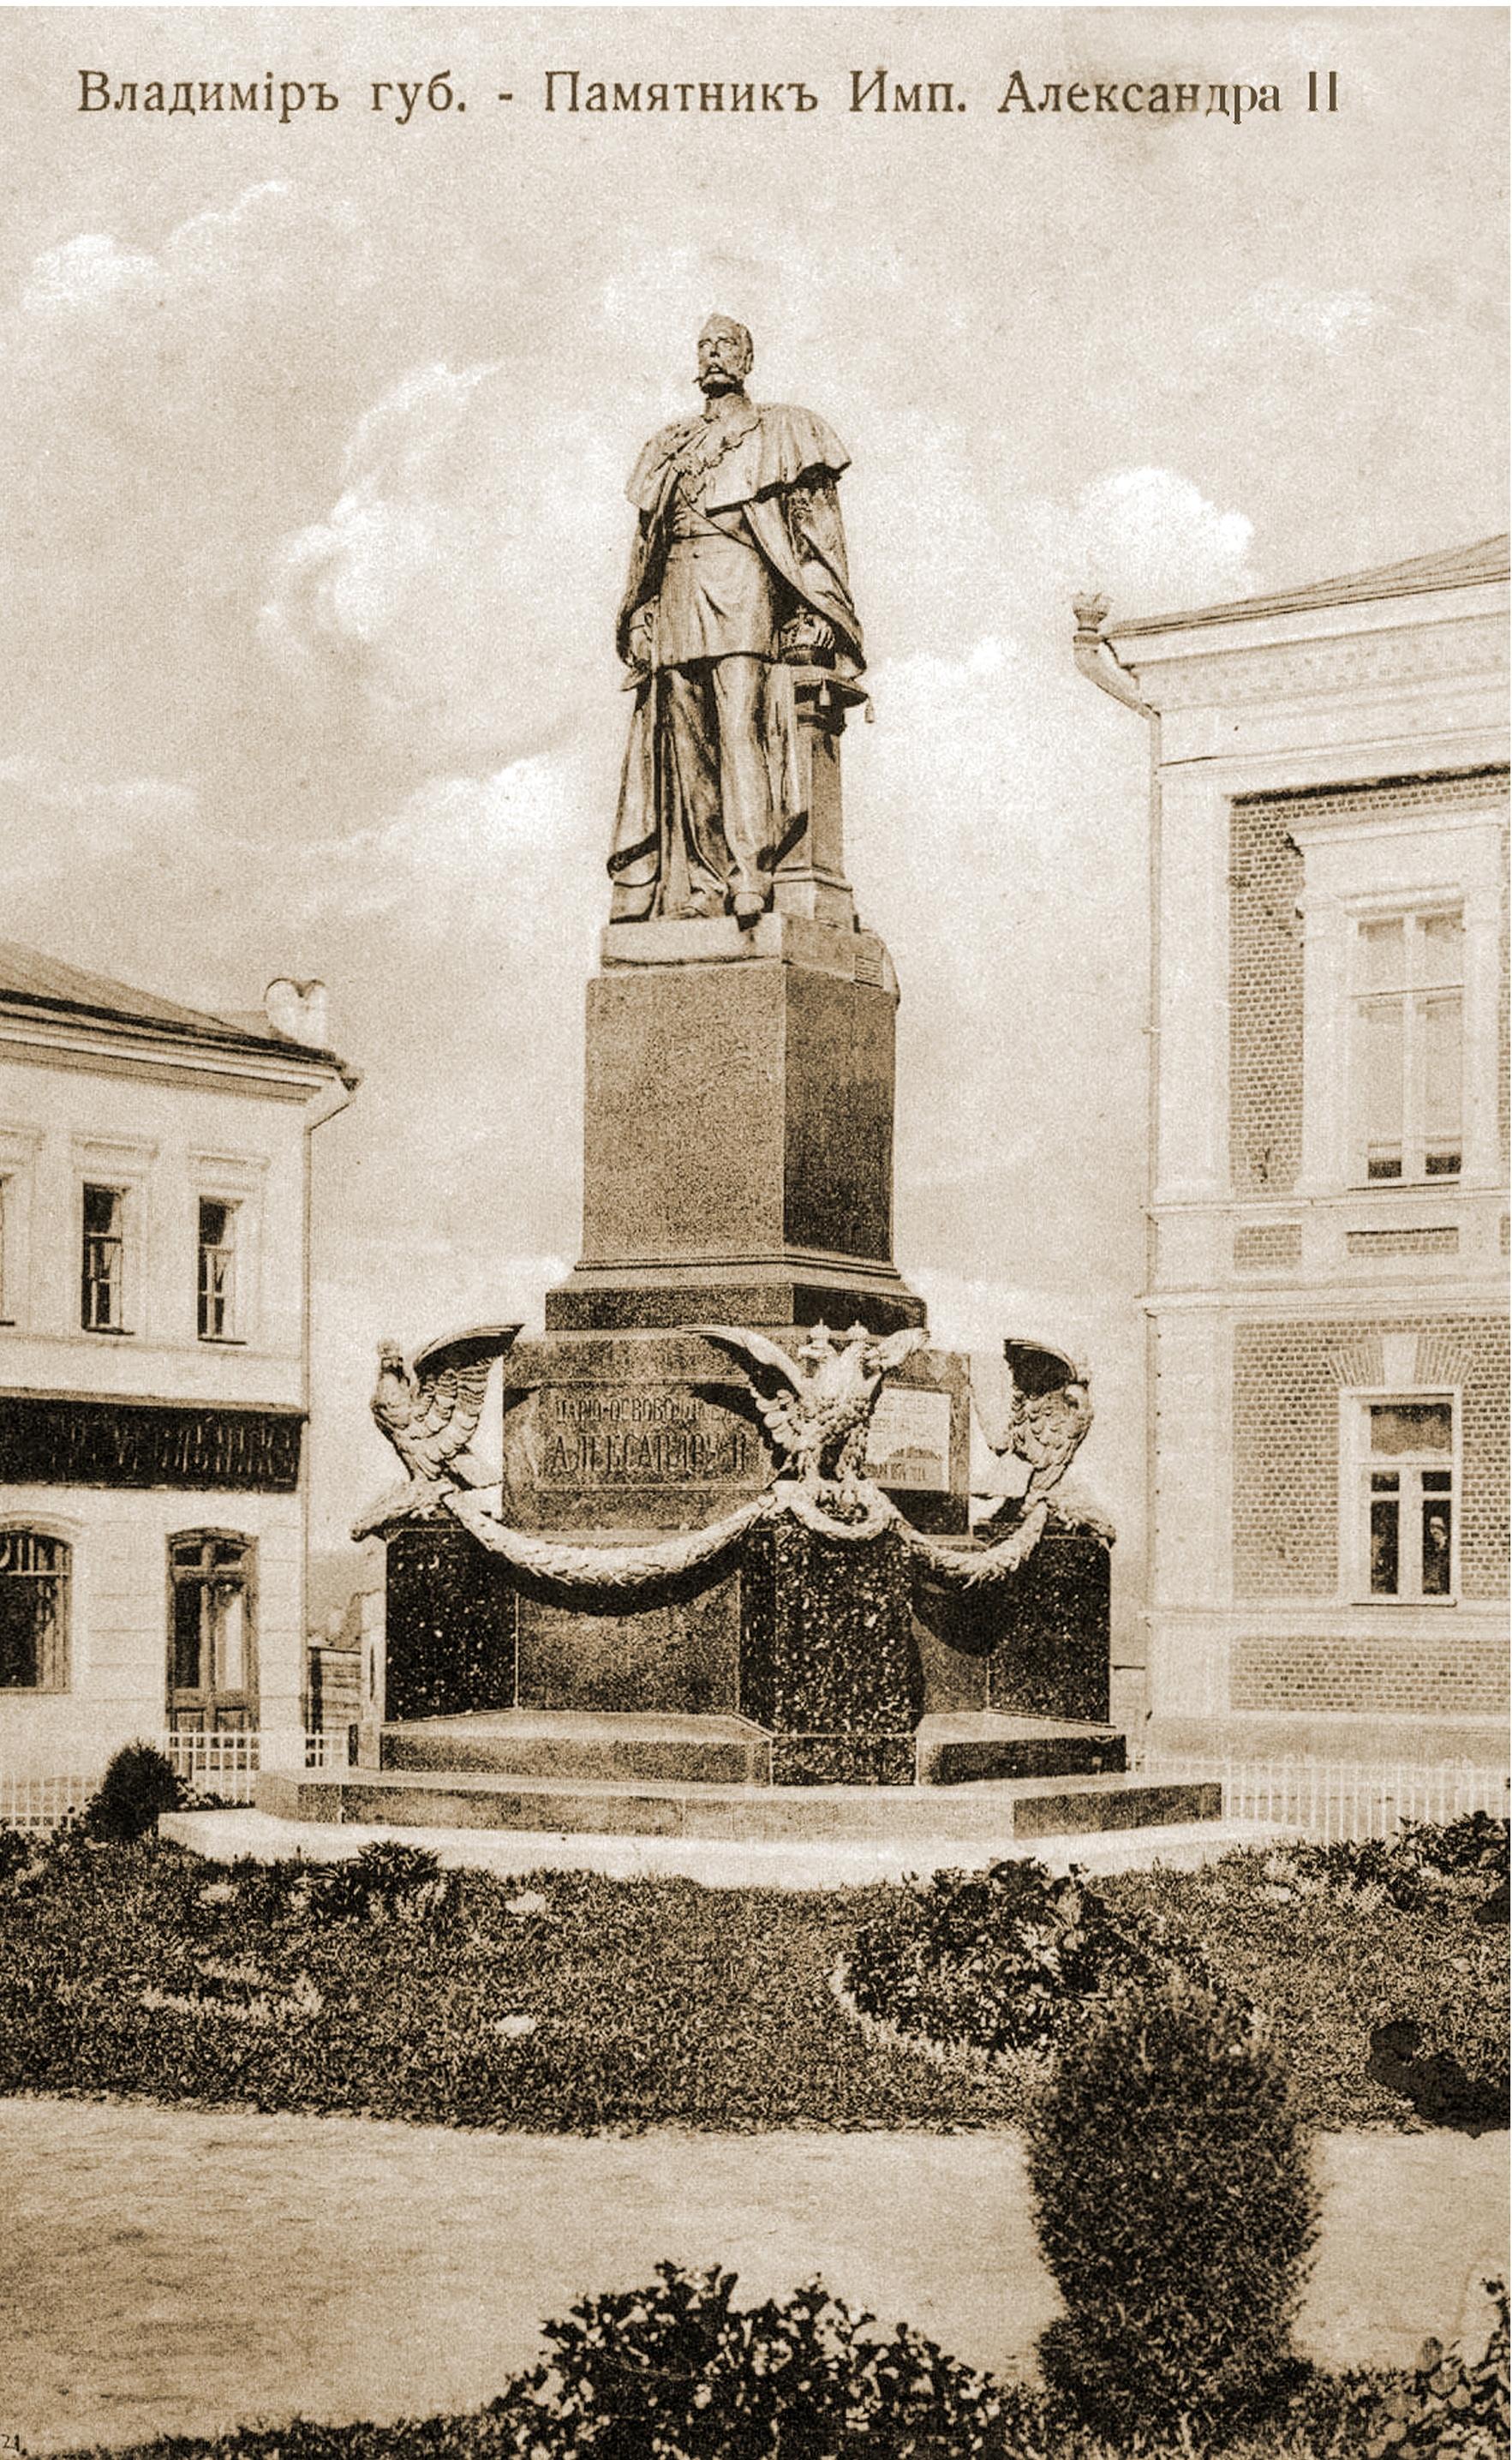 Памятник Имп. Александру II